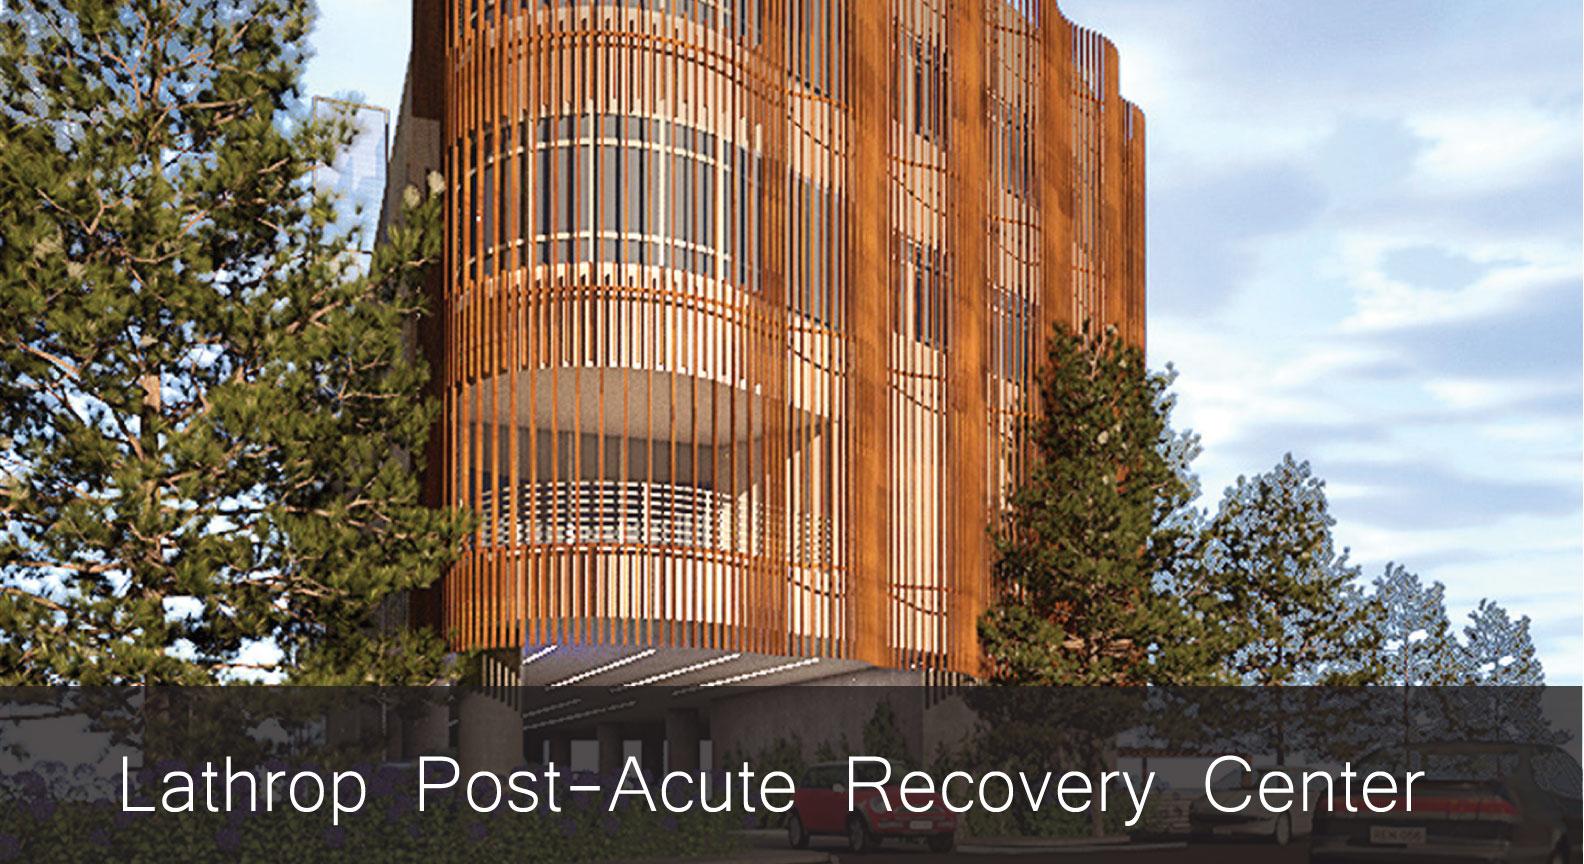 FCA-Lathrop-Post-Acute-Recovery-Center.jpg